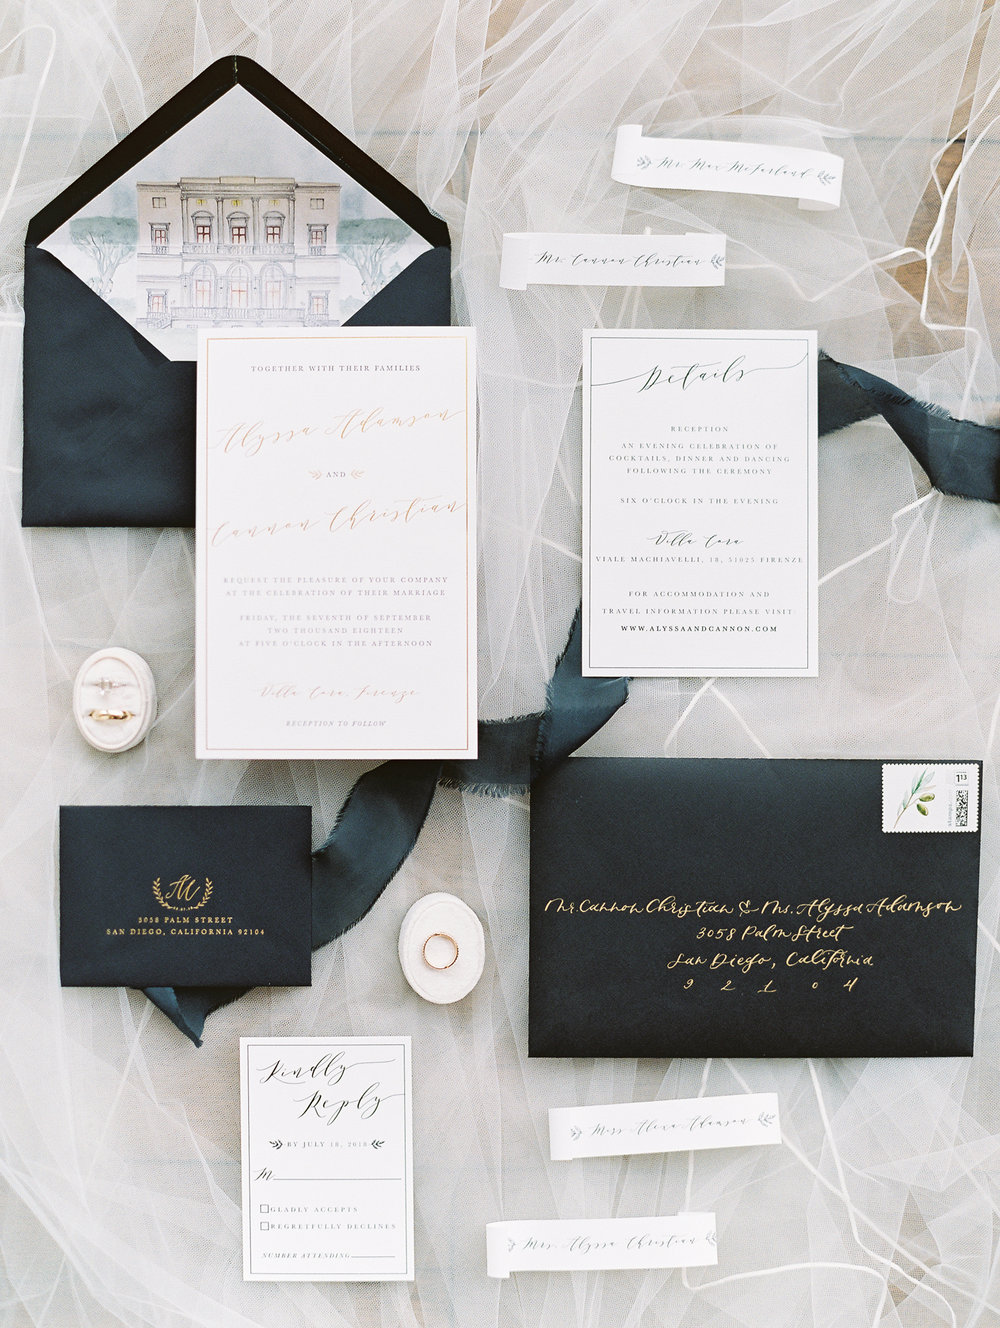 Michelle Garibay Events | Cavin Elizabeth Photography | Elegant Black, White and Gold Wedding | Custom Illustrated Envelope Liner